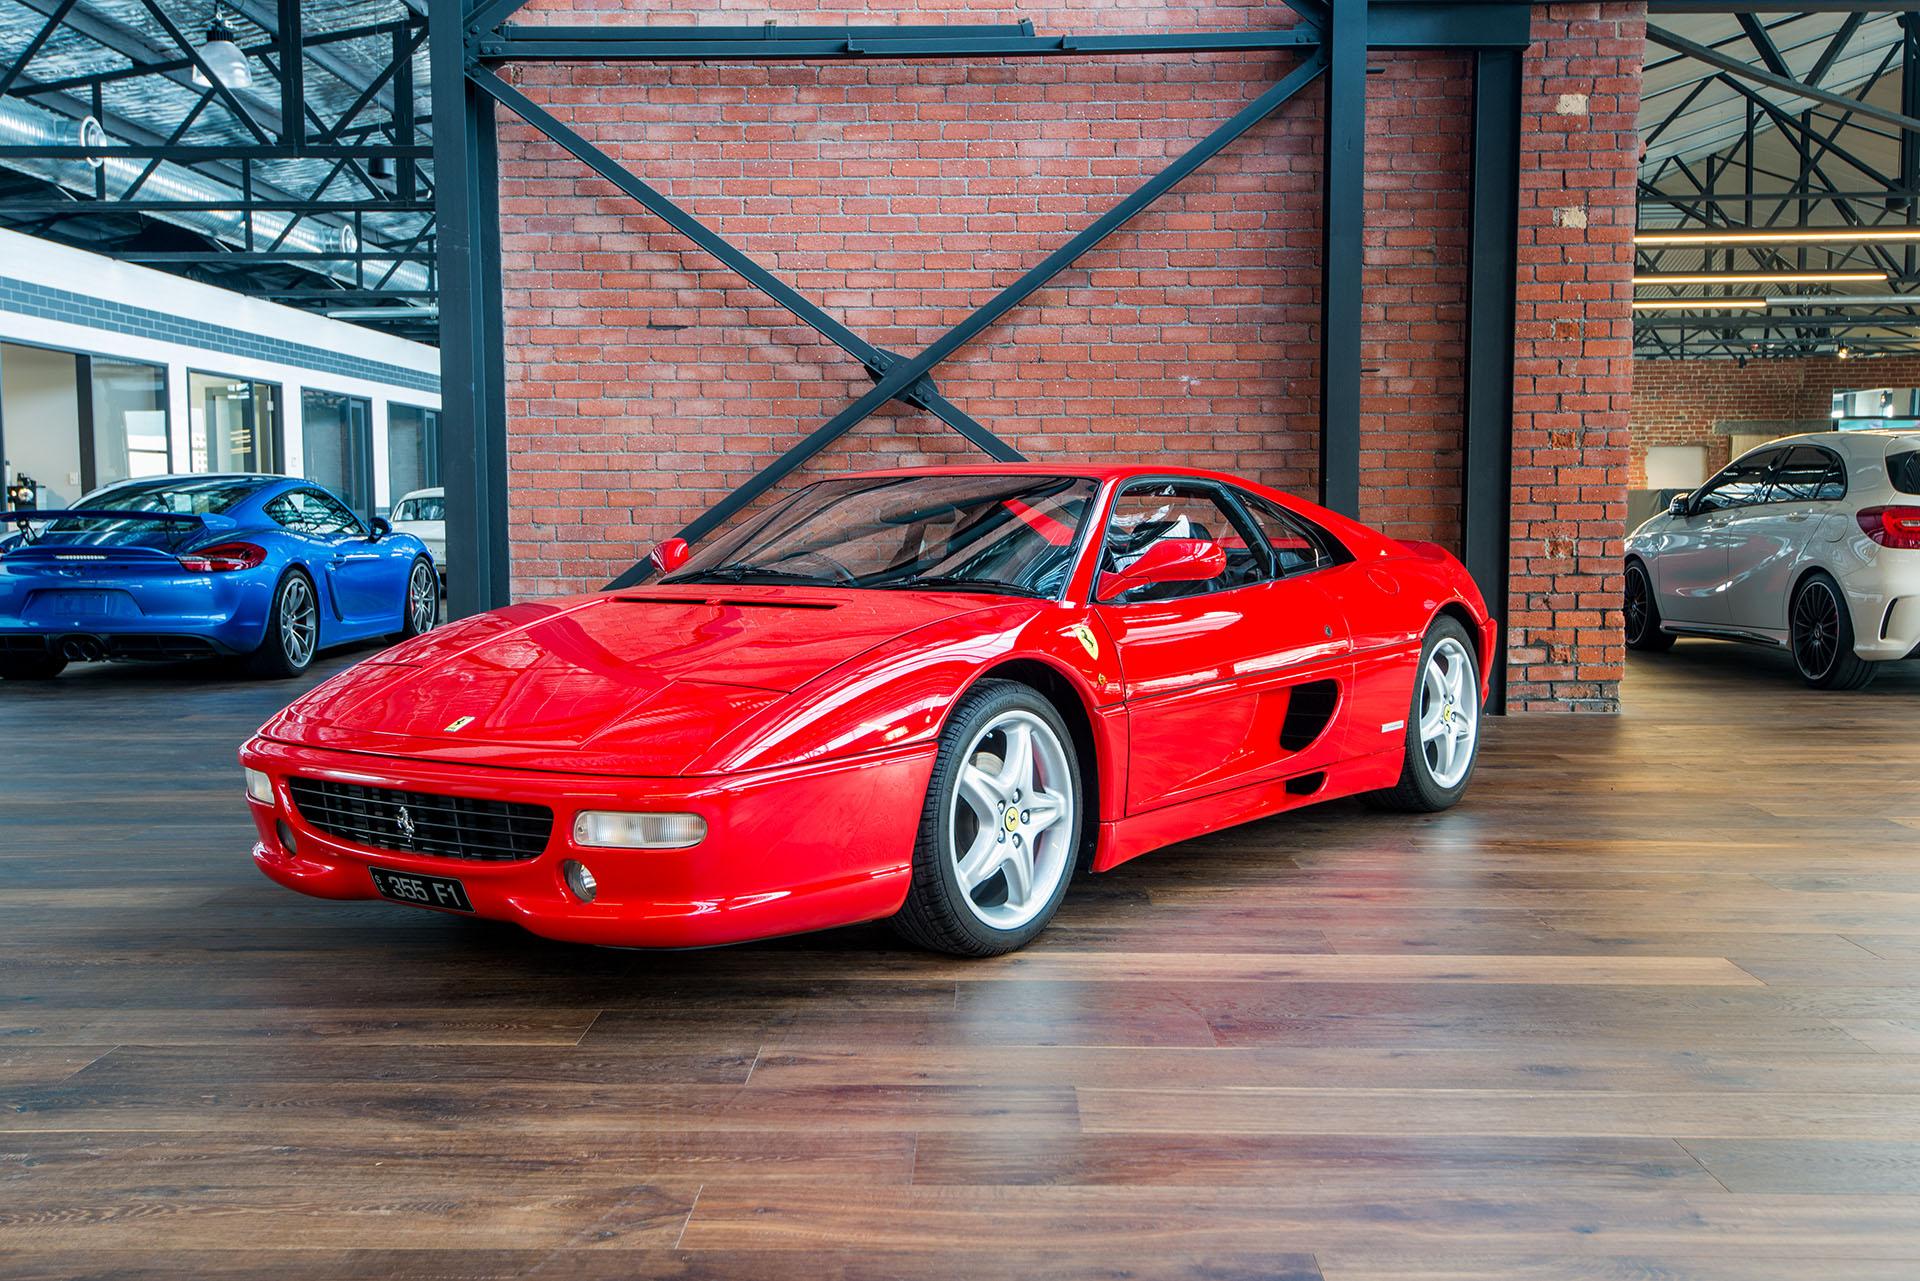 Floor Mats For Car >> 1998 Ferrari 355 Berlinetta F1 - Richmonds - Classic and ...